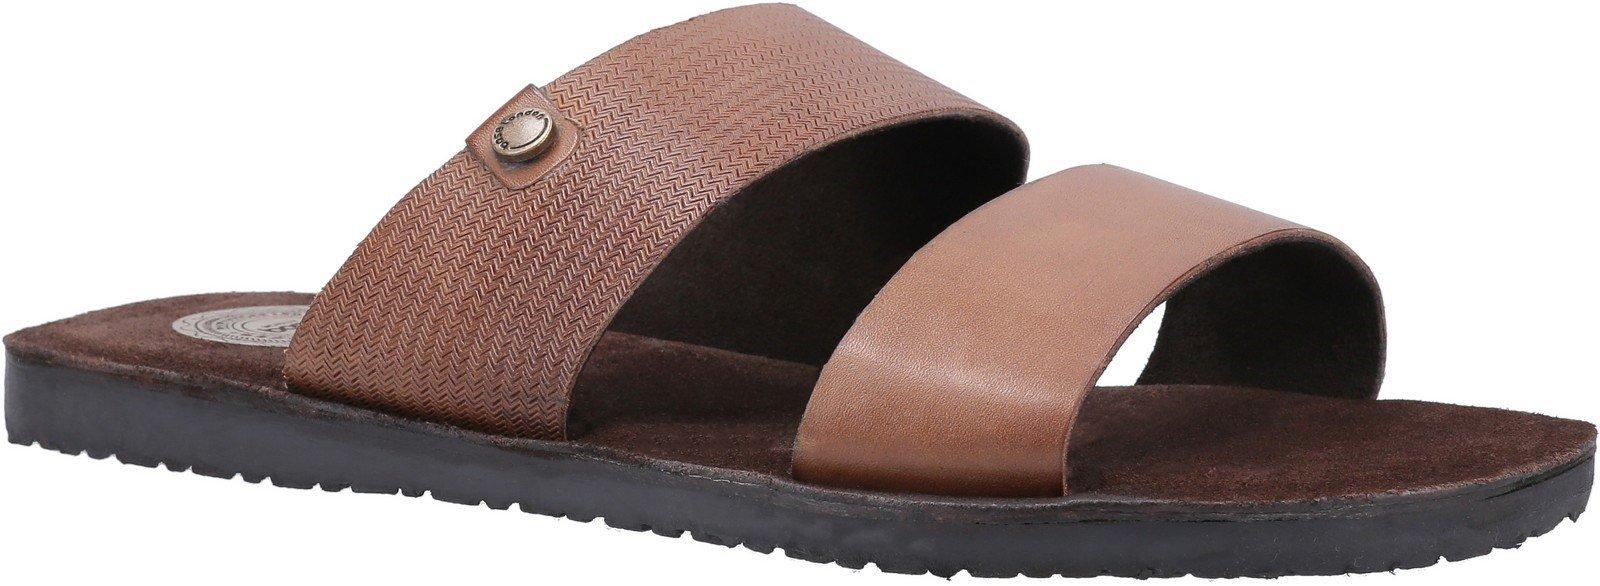 Base London Men's Julius Waxy Slip On Sandal Various Colours 30442 - Tan 6